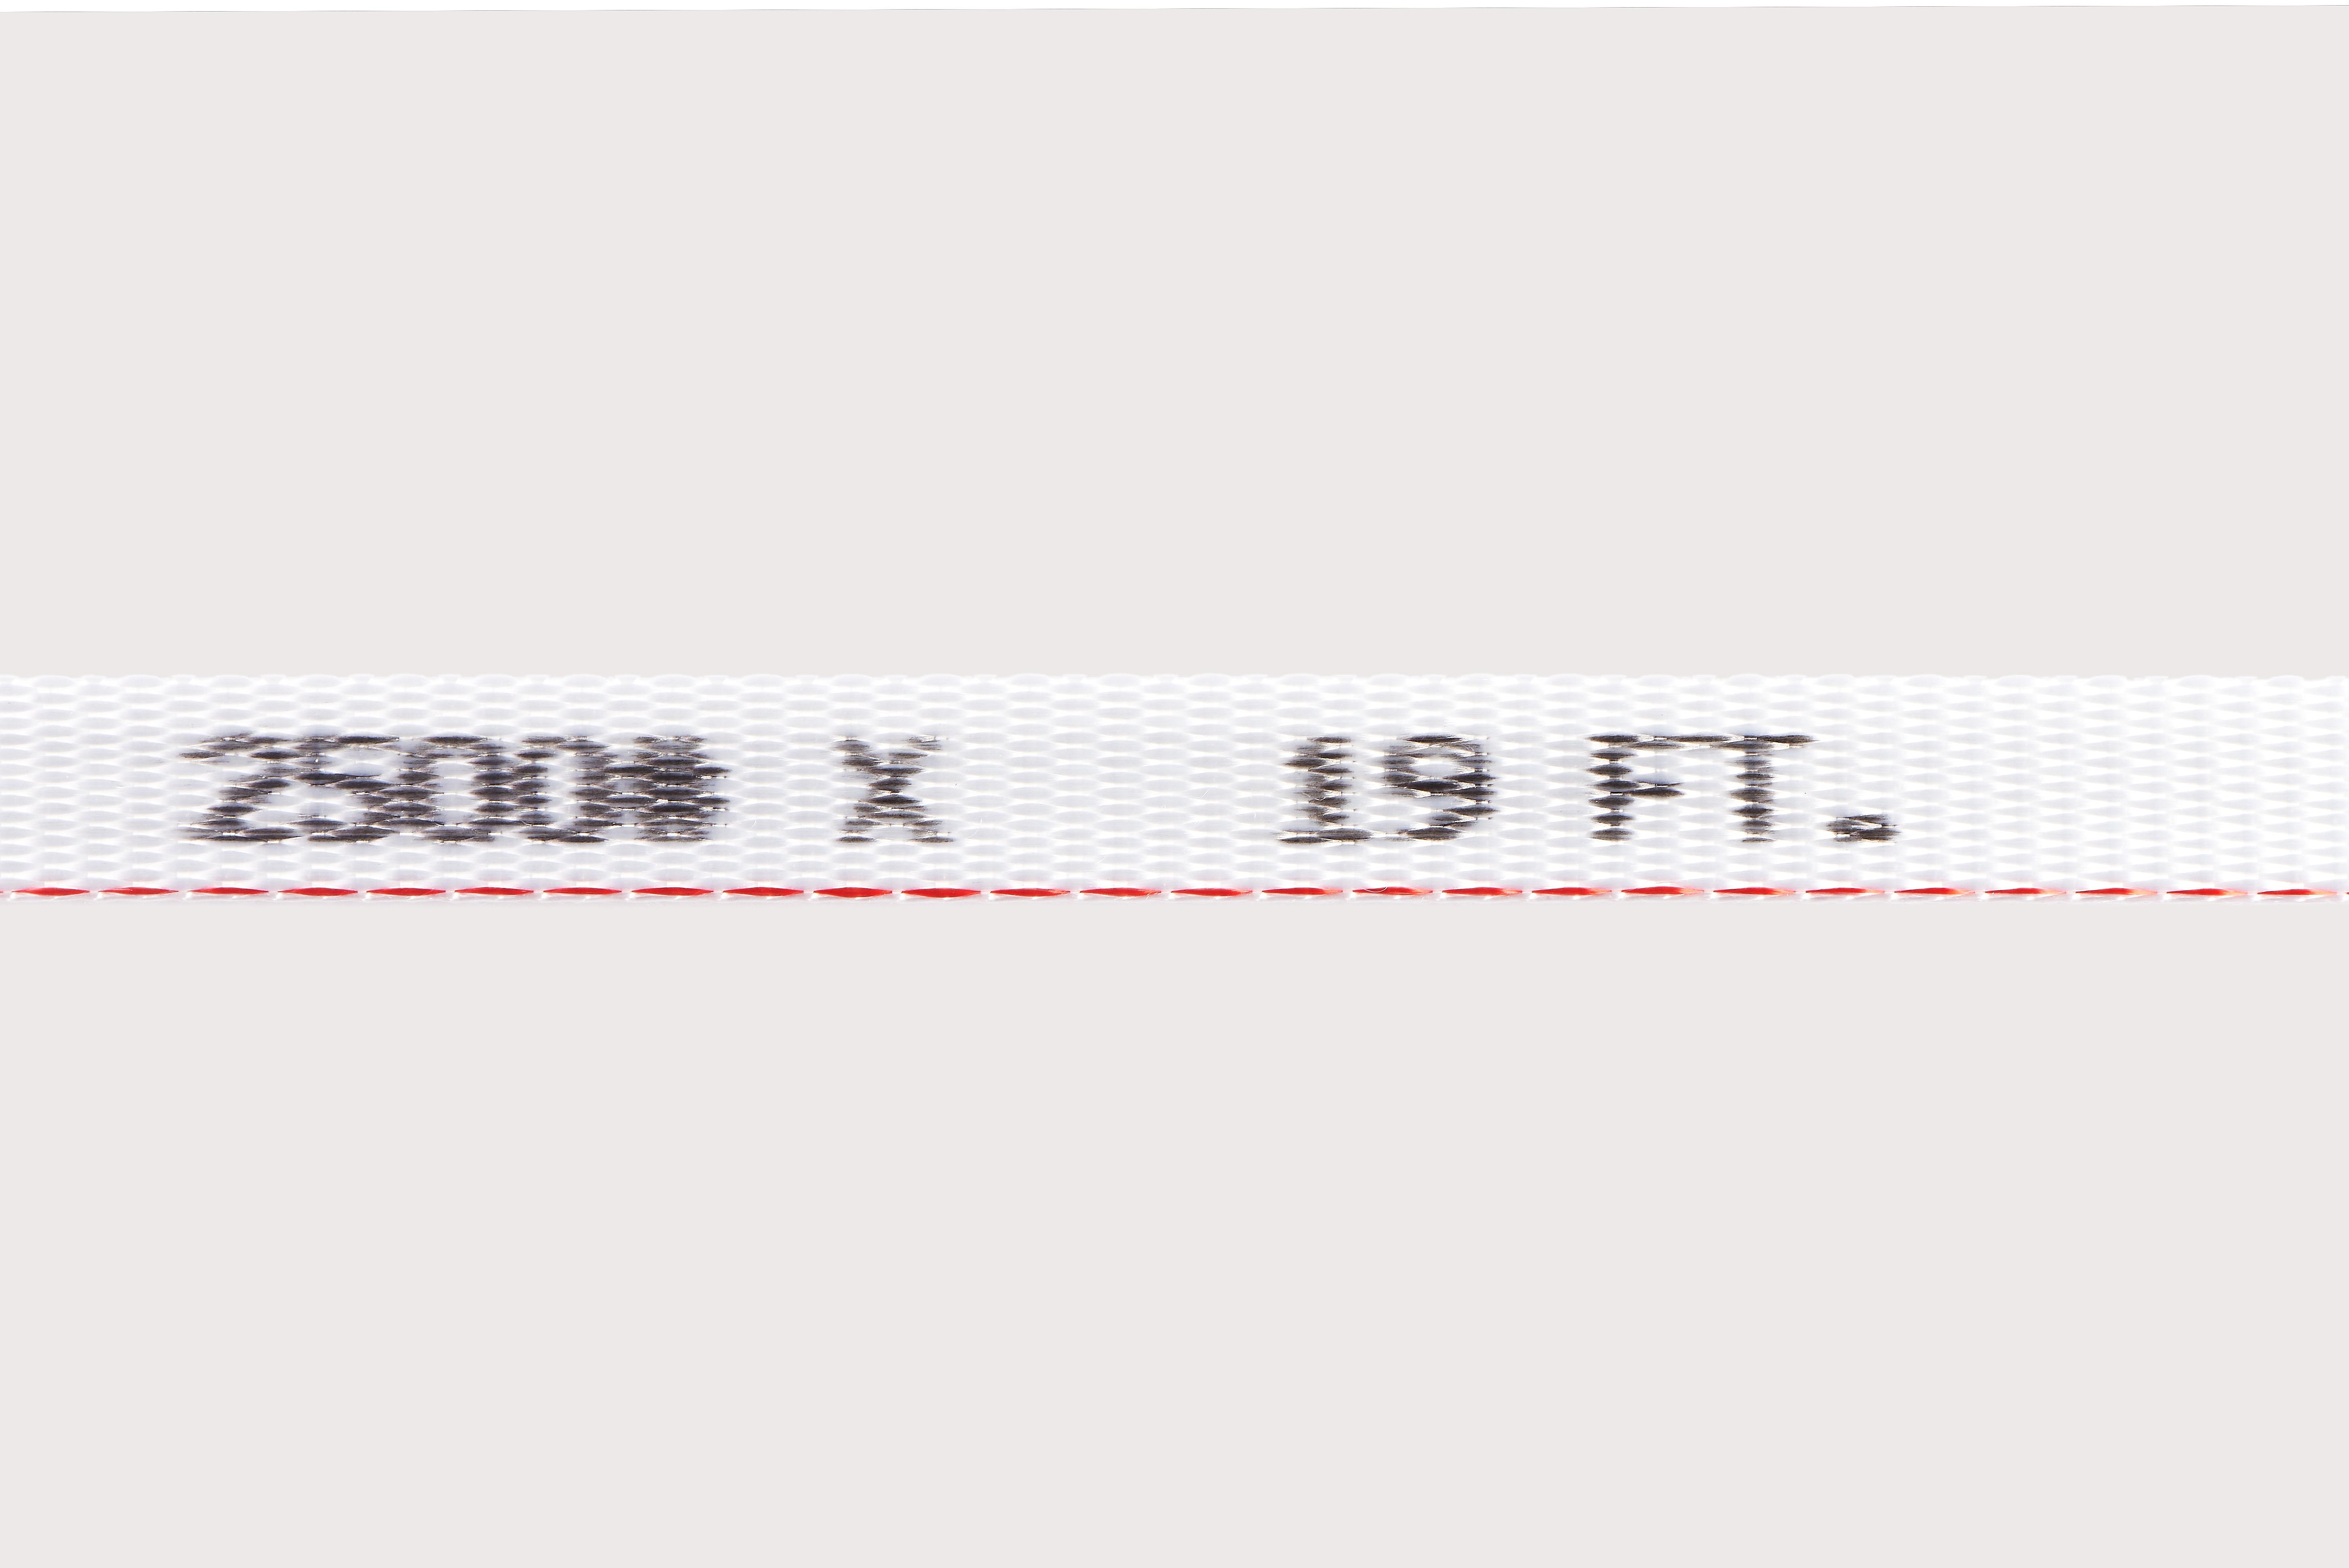 Orion-Cordage-Slick-Tape-White-Horizontal71.jpg